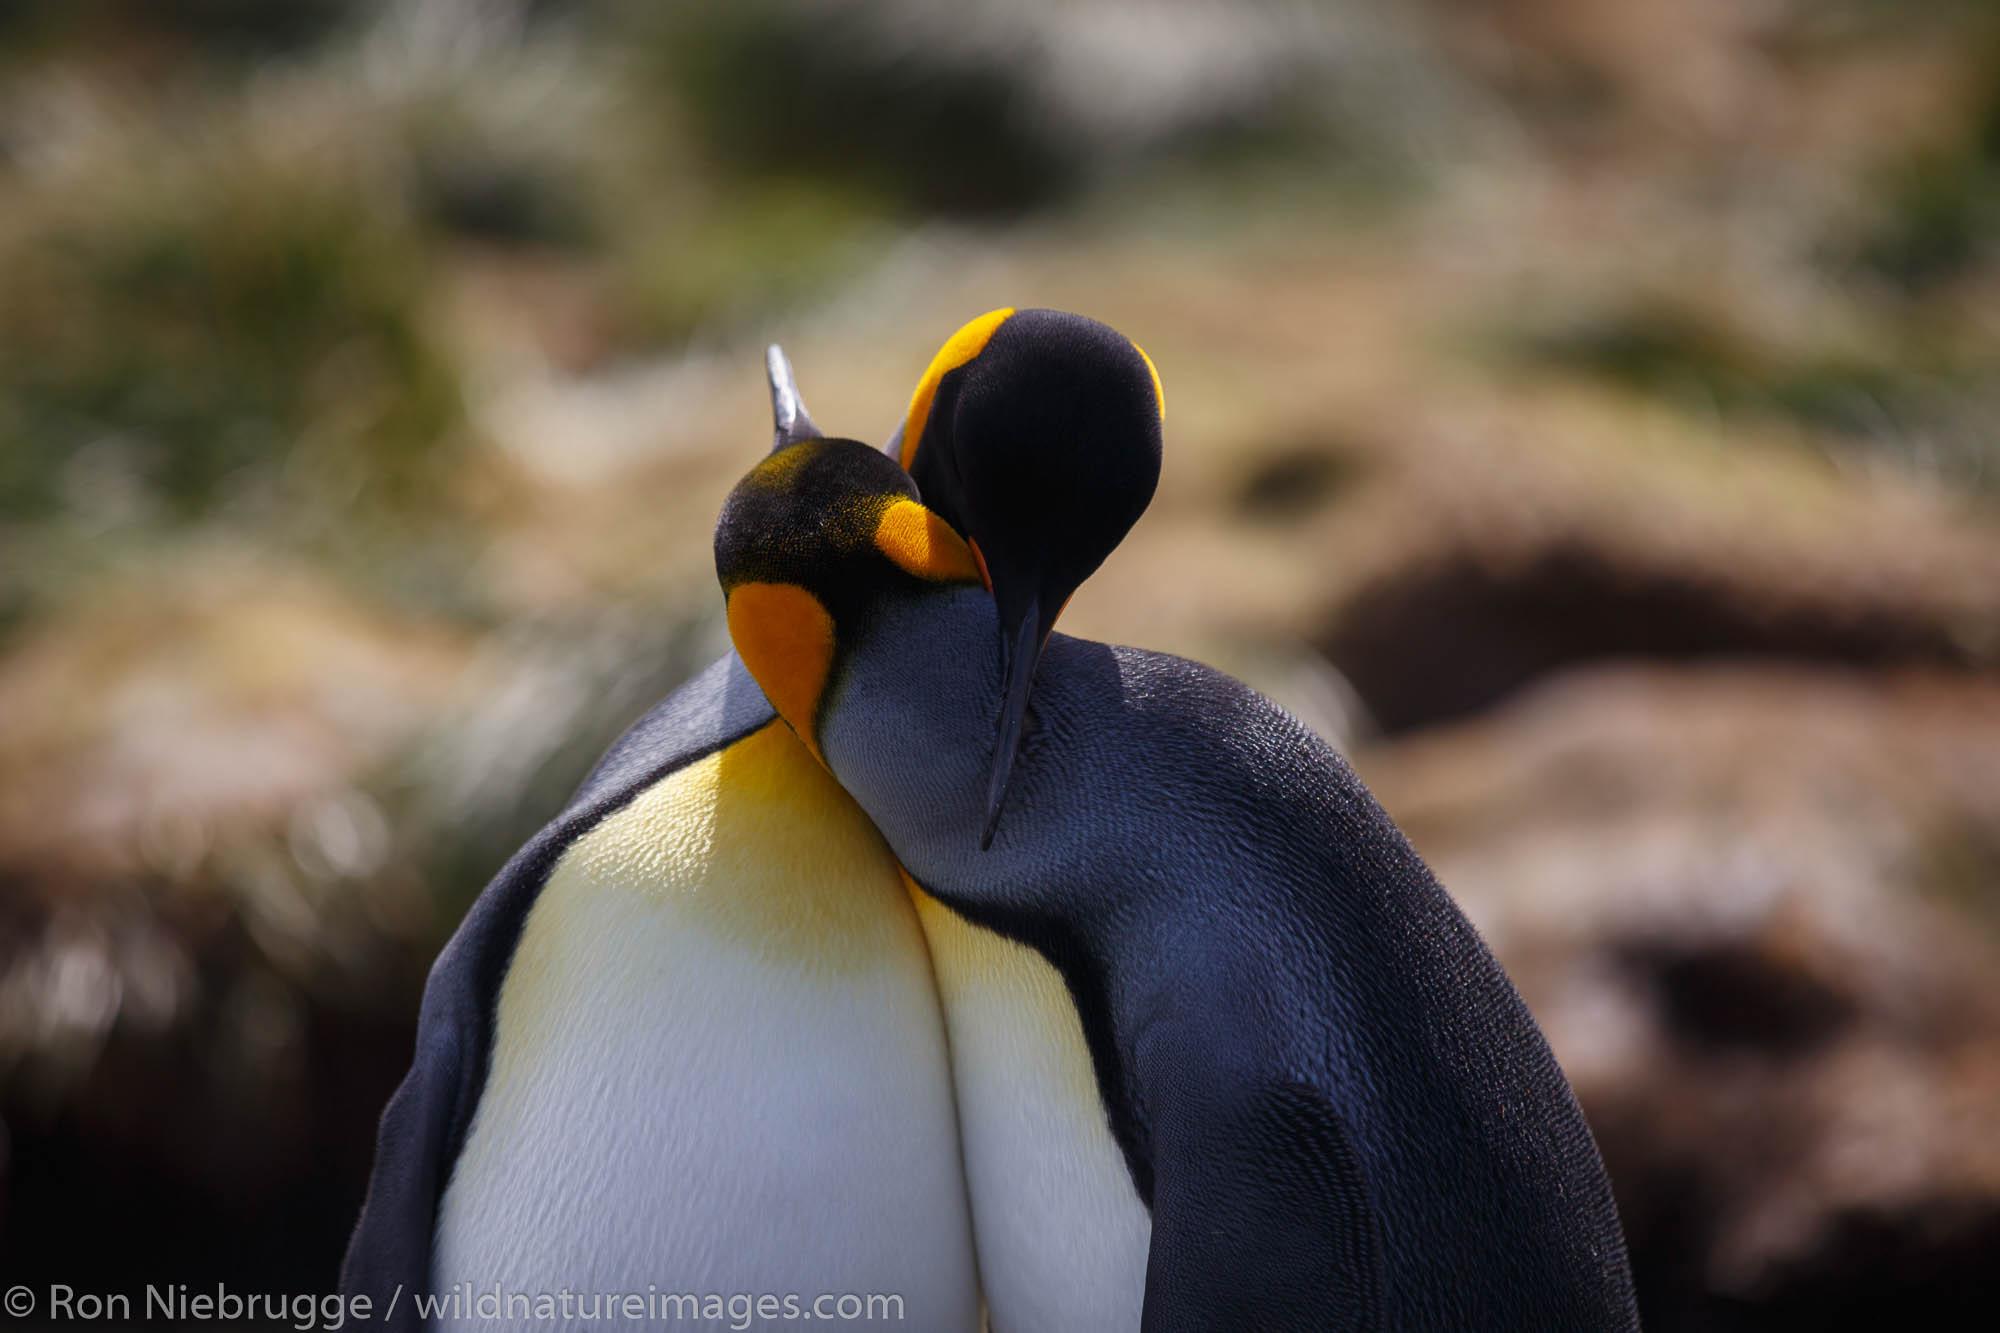 King penguins (Aptenodytes patagonicus), Gold Harbour, South Georgia, Antarctica.